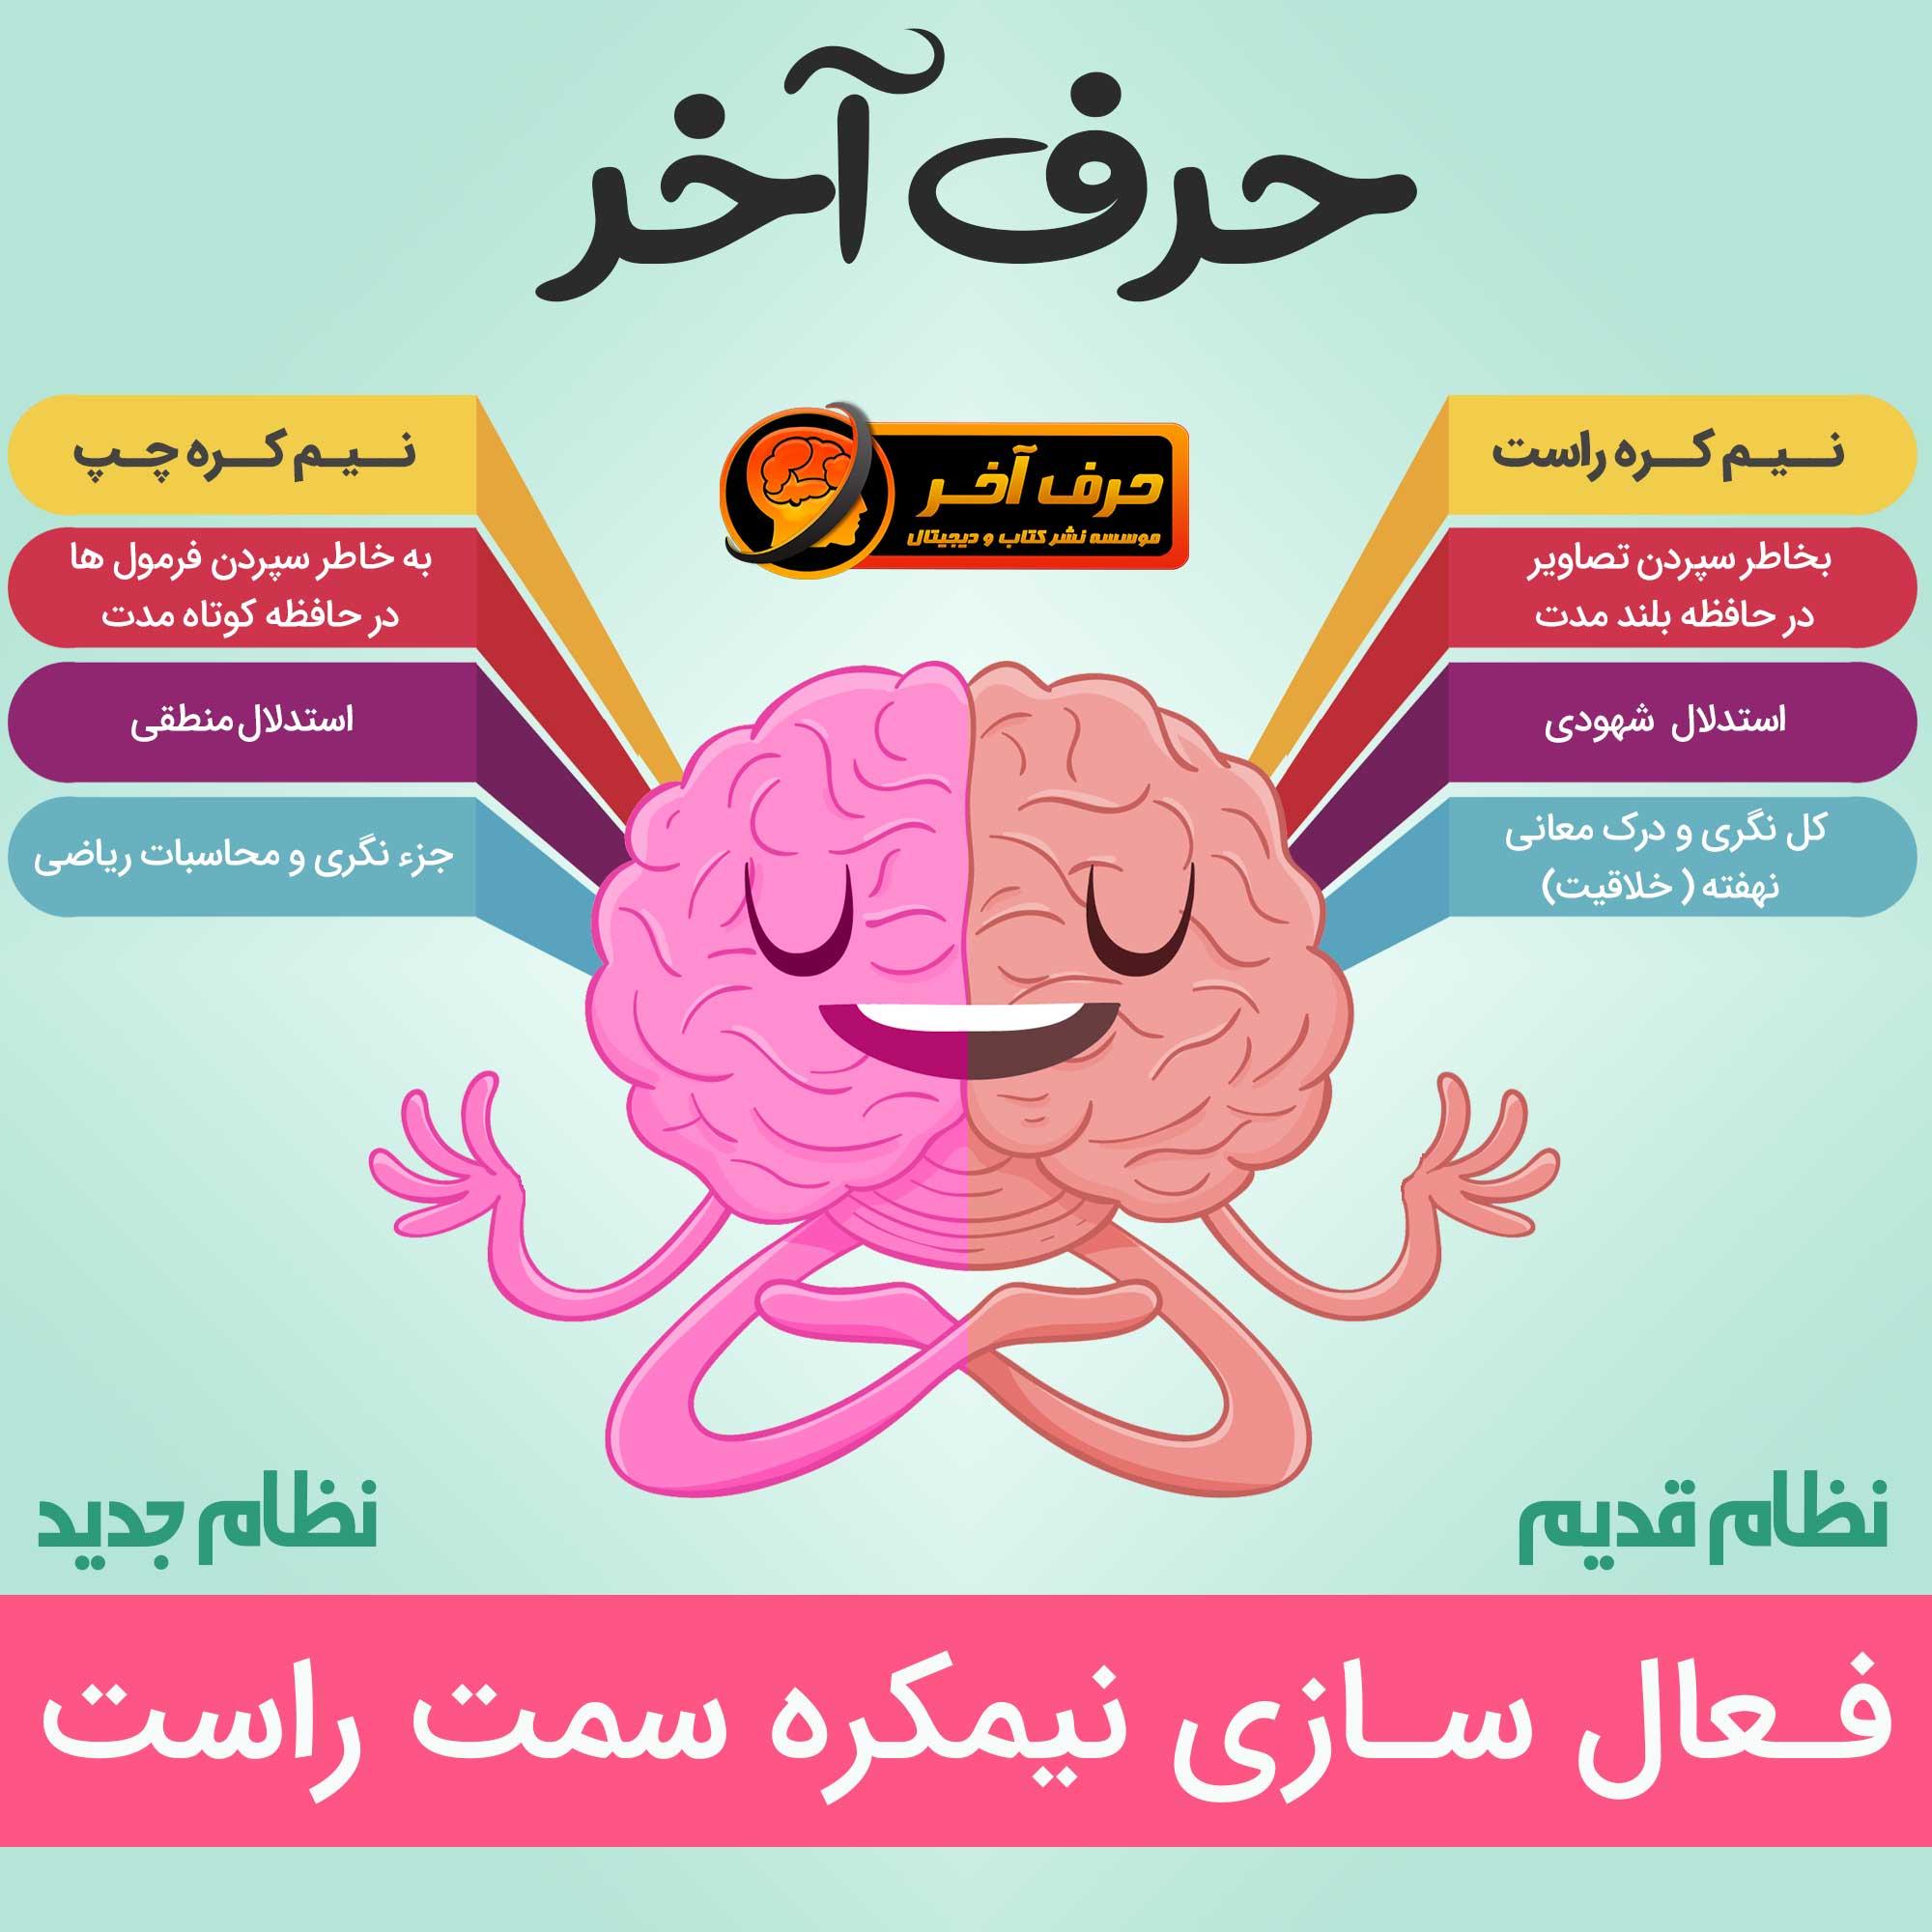 حرف آخر - نیمکره مغز